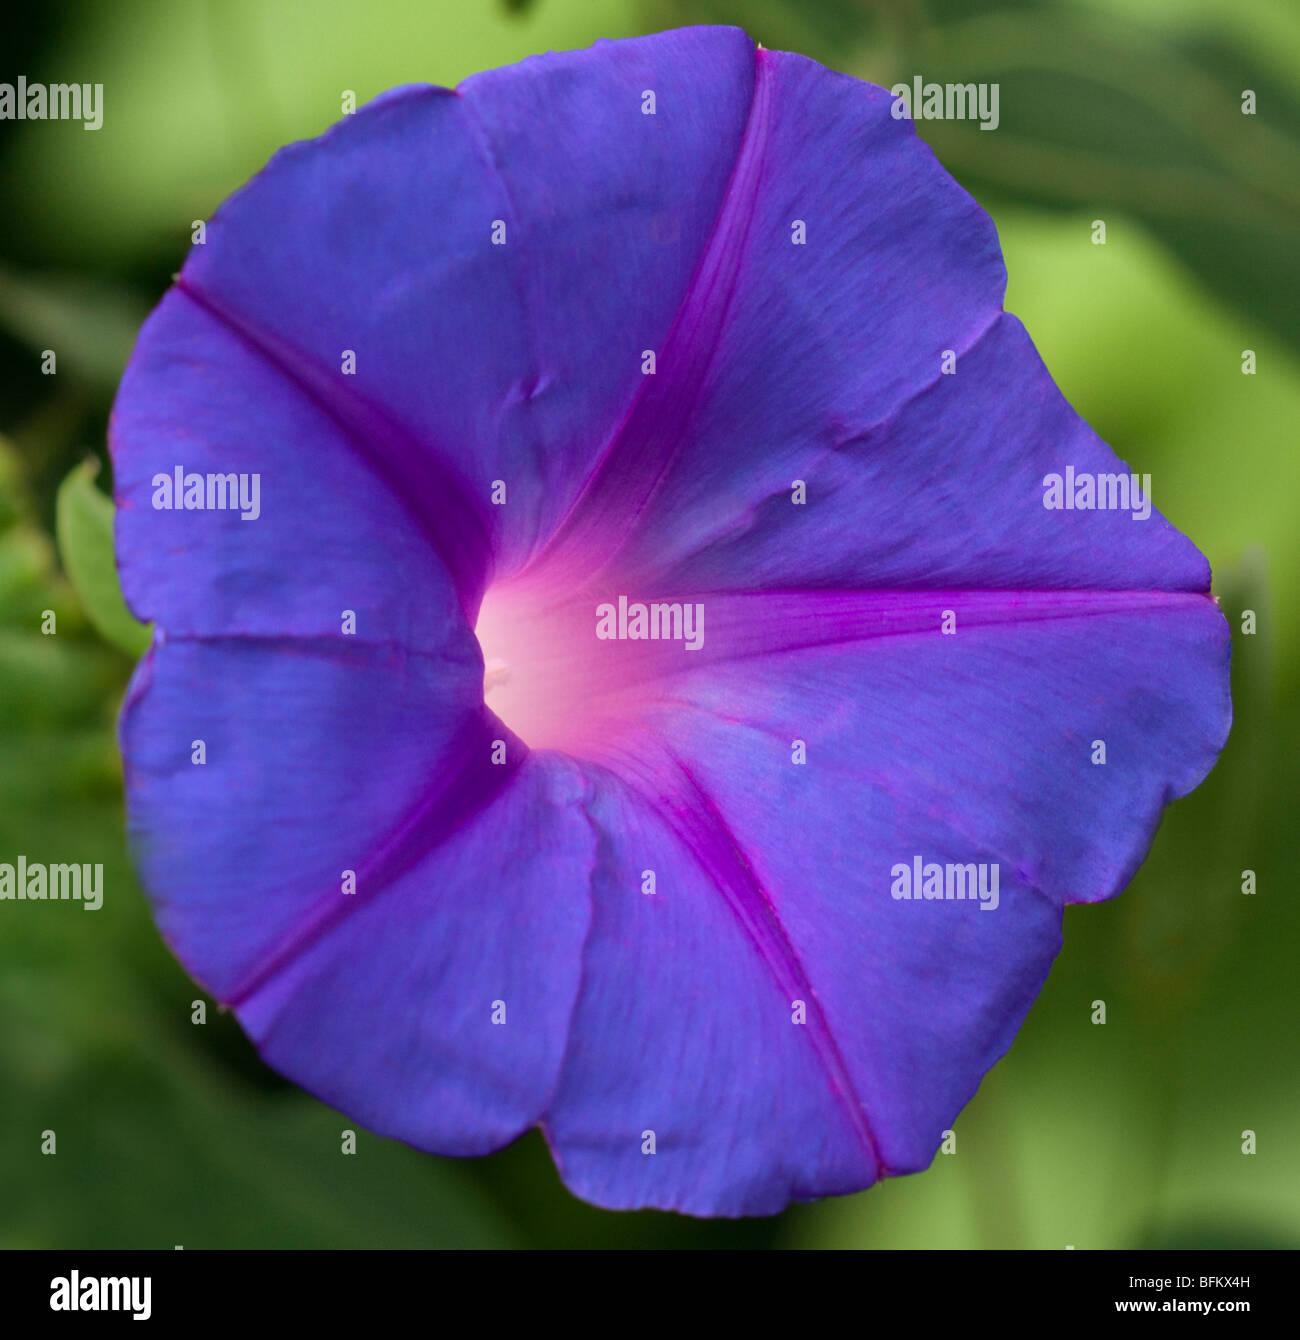 Purple Ipomoea Tricolour (Morning Glory) - Stock Image